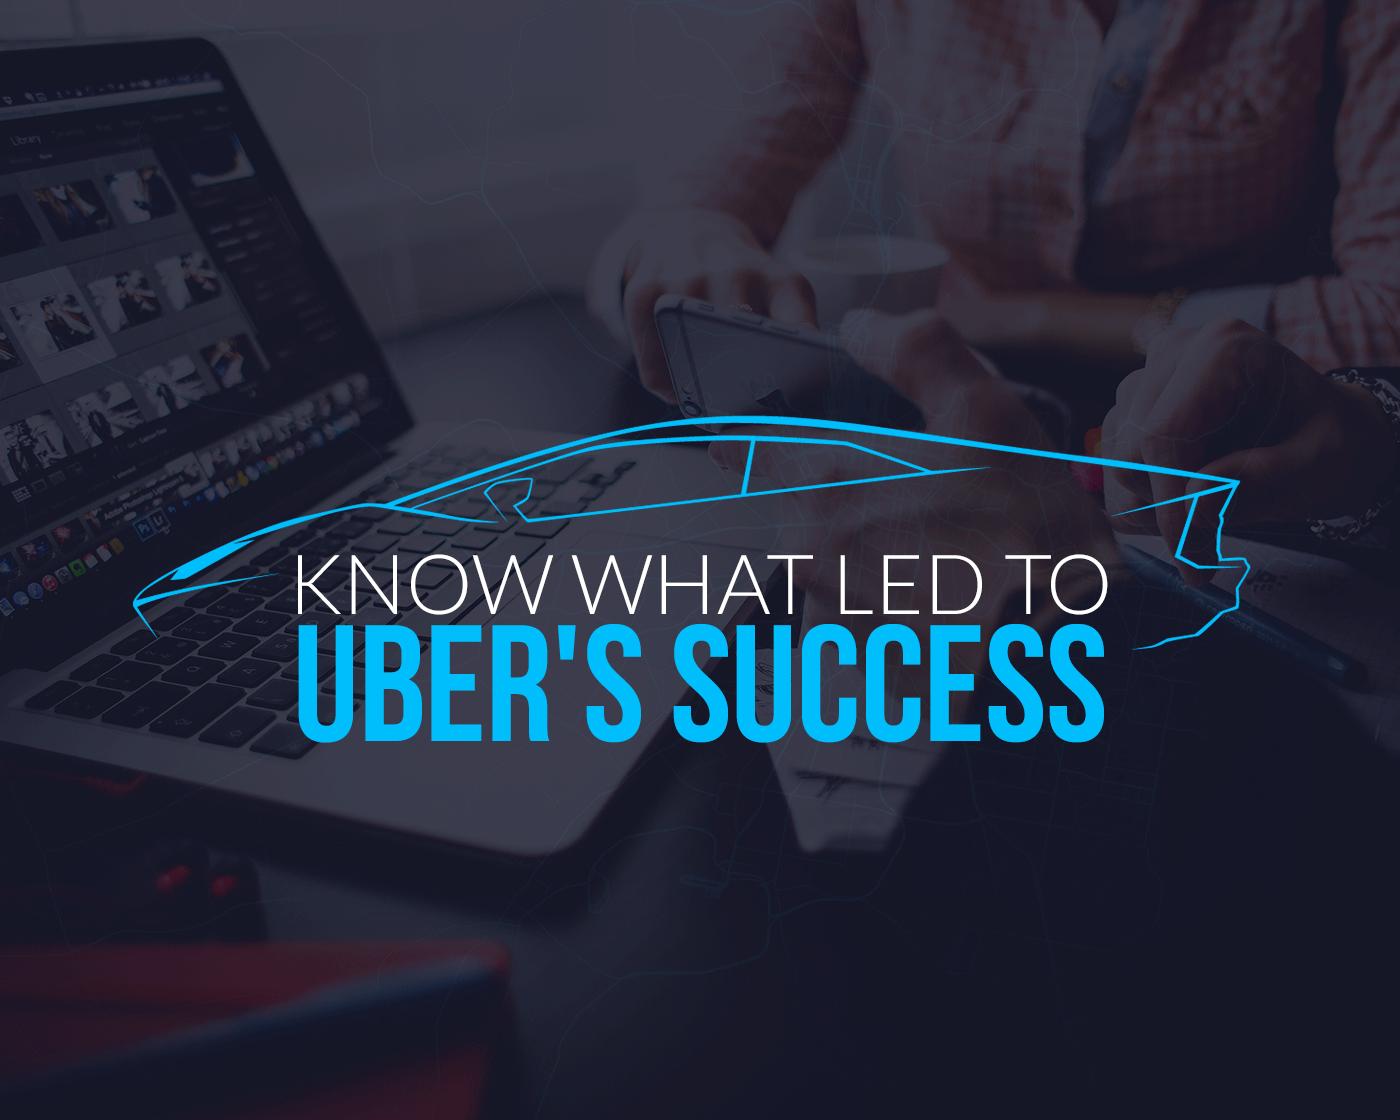 4 Secret Points Behind Taxi Booking App Uber's Success | Idea Cafe Blog